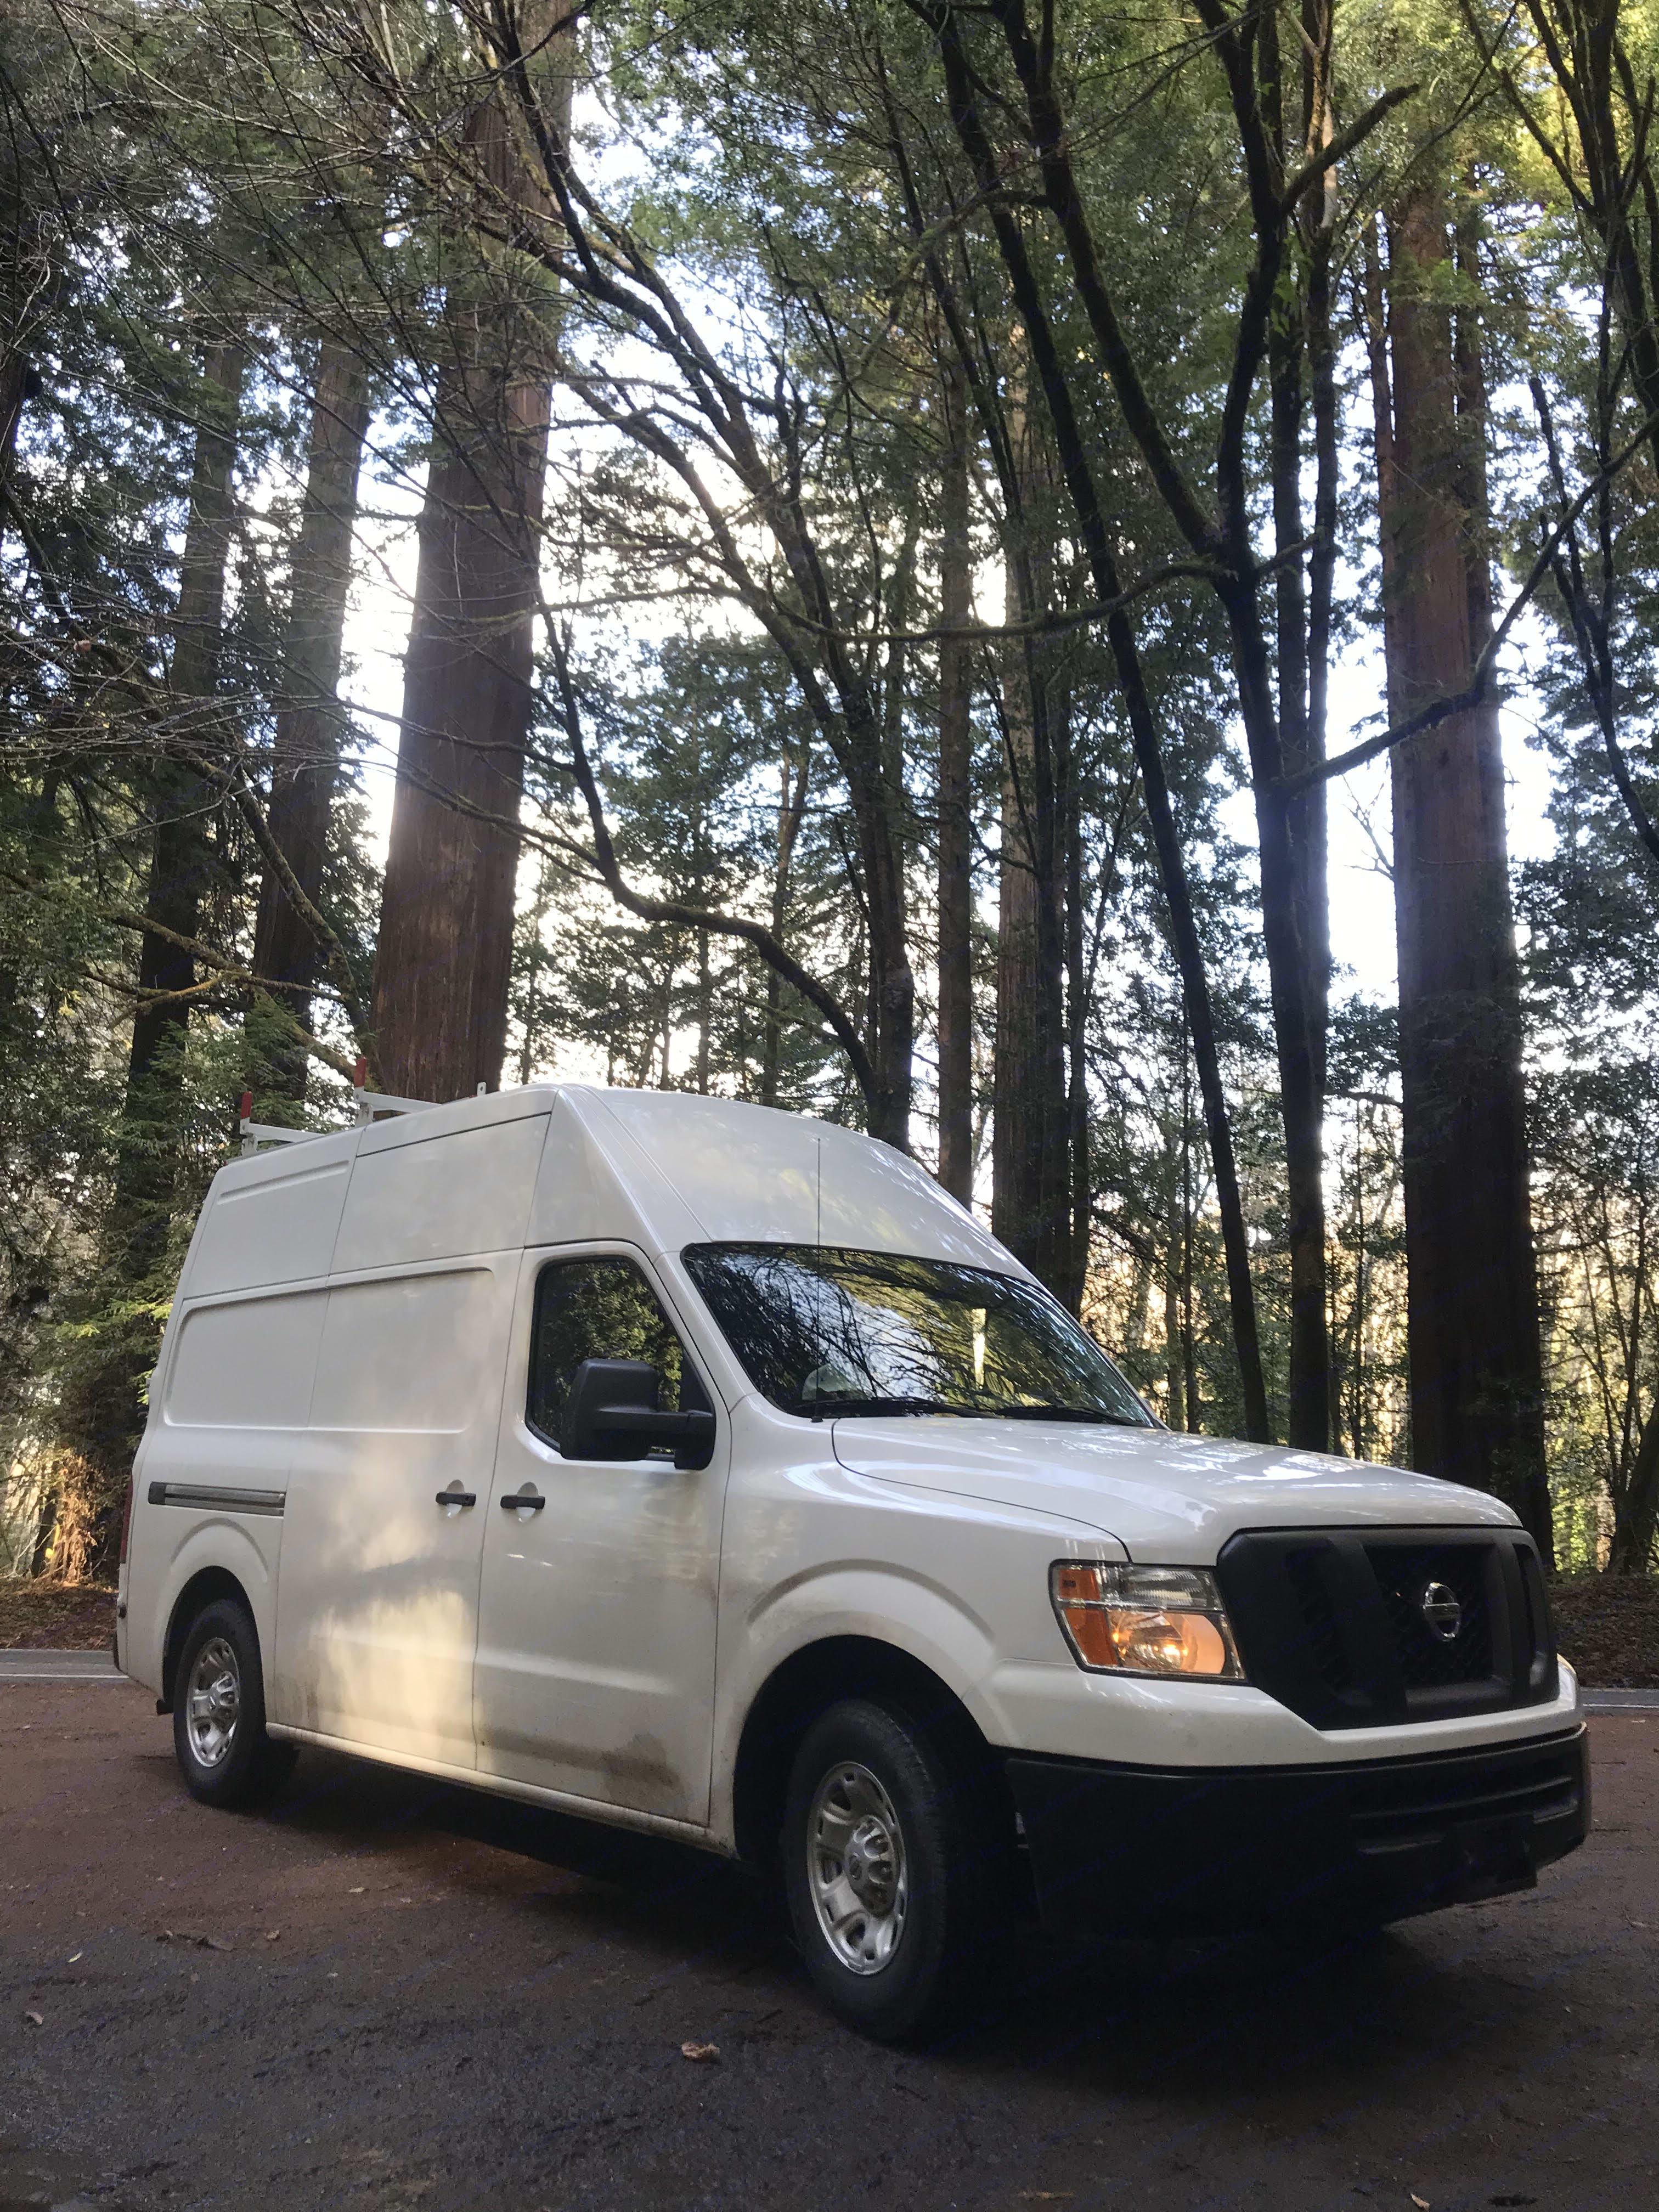 Van the Adventure exploring the California Redwoods.. Other Other 2018